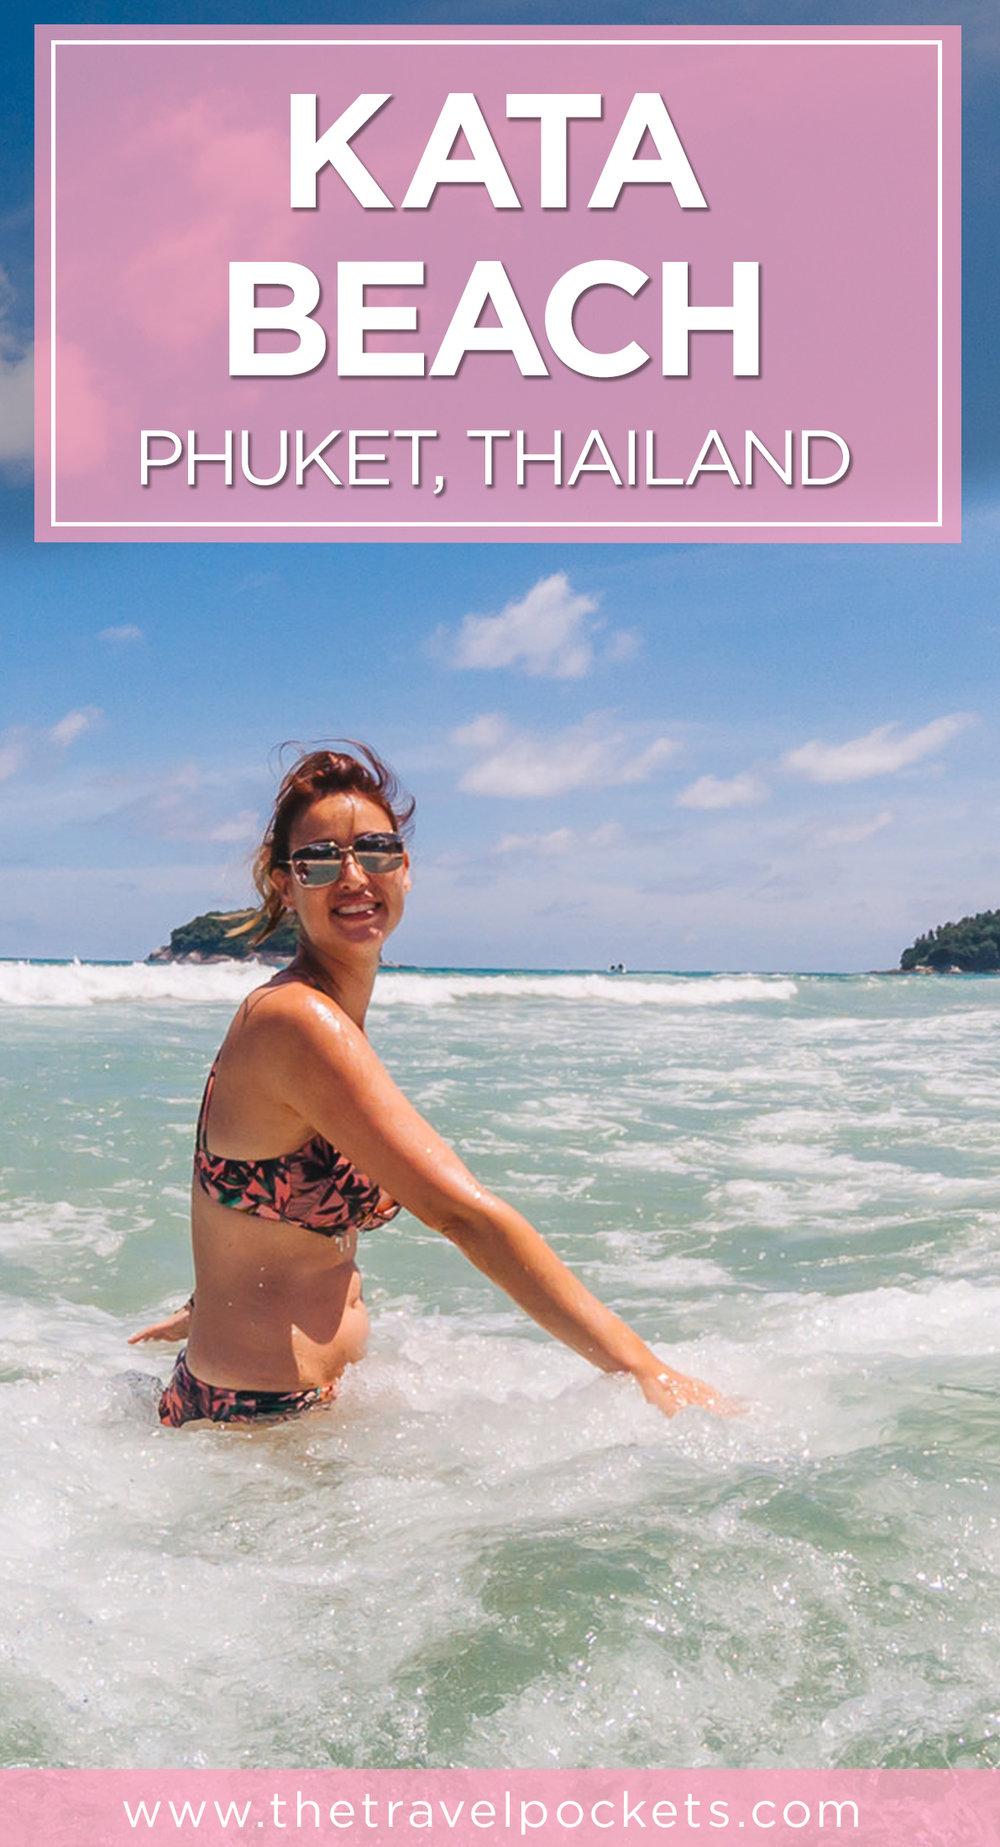 Kata Beach Thailand www.thetravelpockets.com